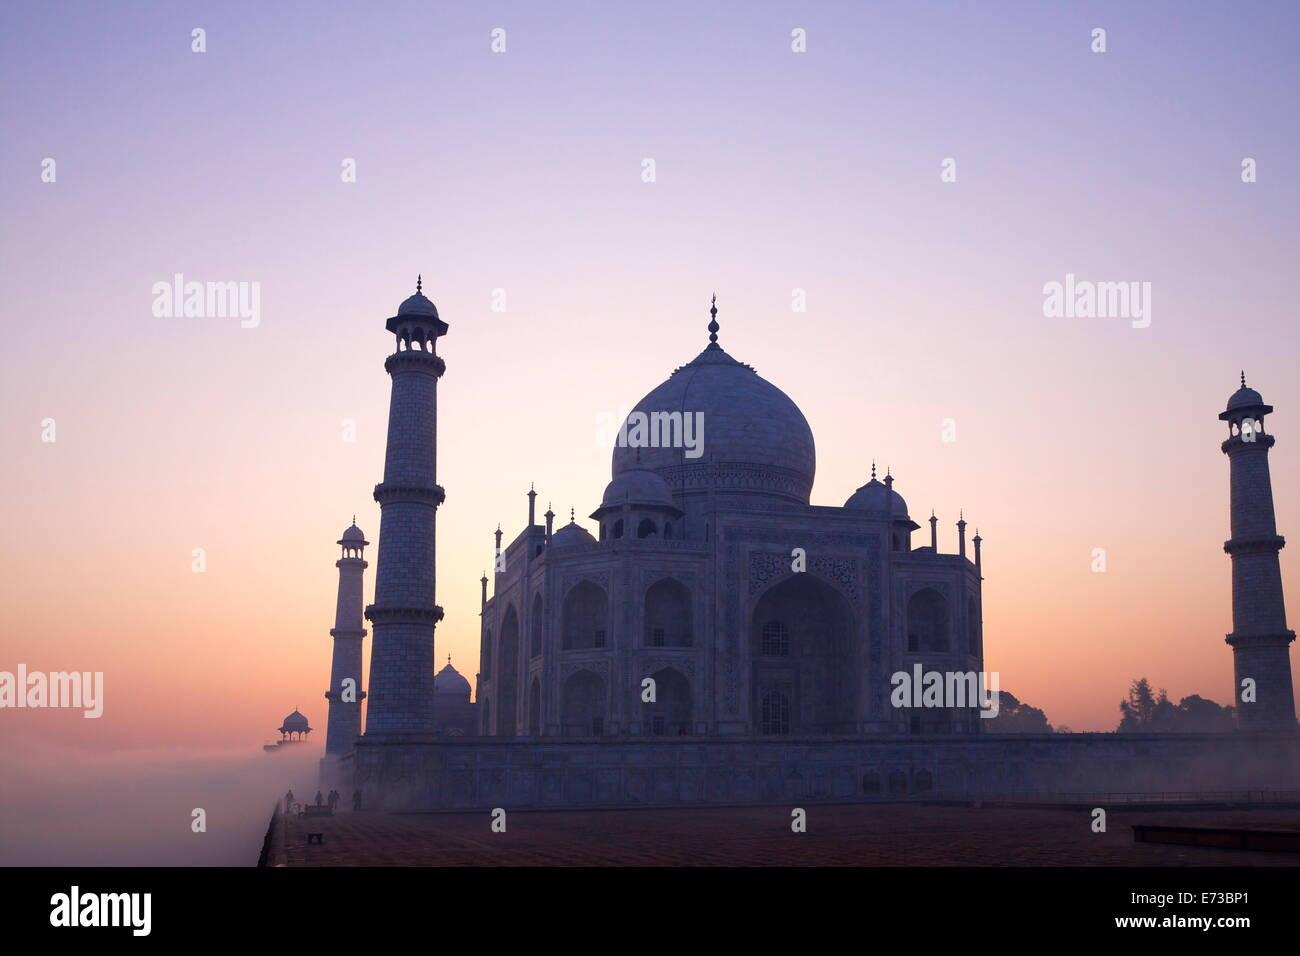 Taj Mahal at sunrise, UNESCO World Heritage Site, Agra, Uttar Pradesh, India, Asia - Stock Image